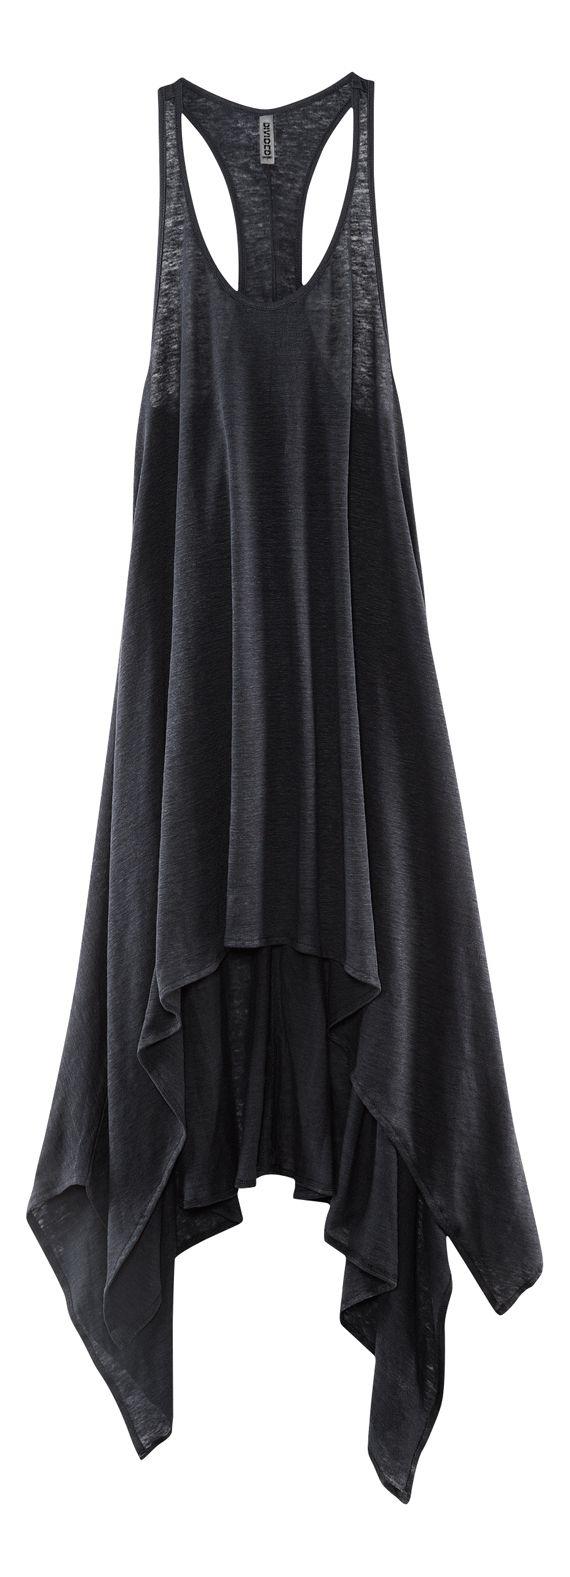 H Divided Grey - assymetrical hem tank dress